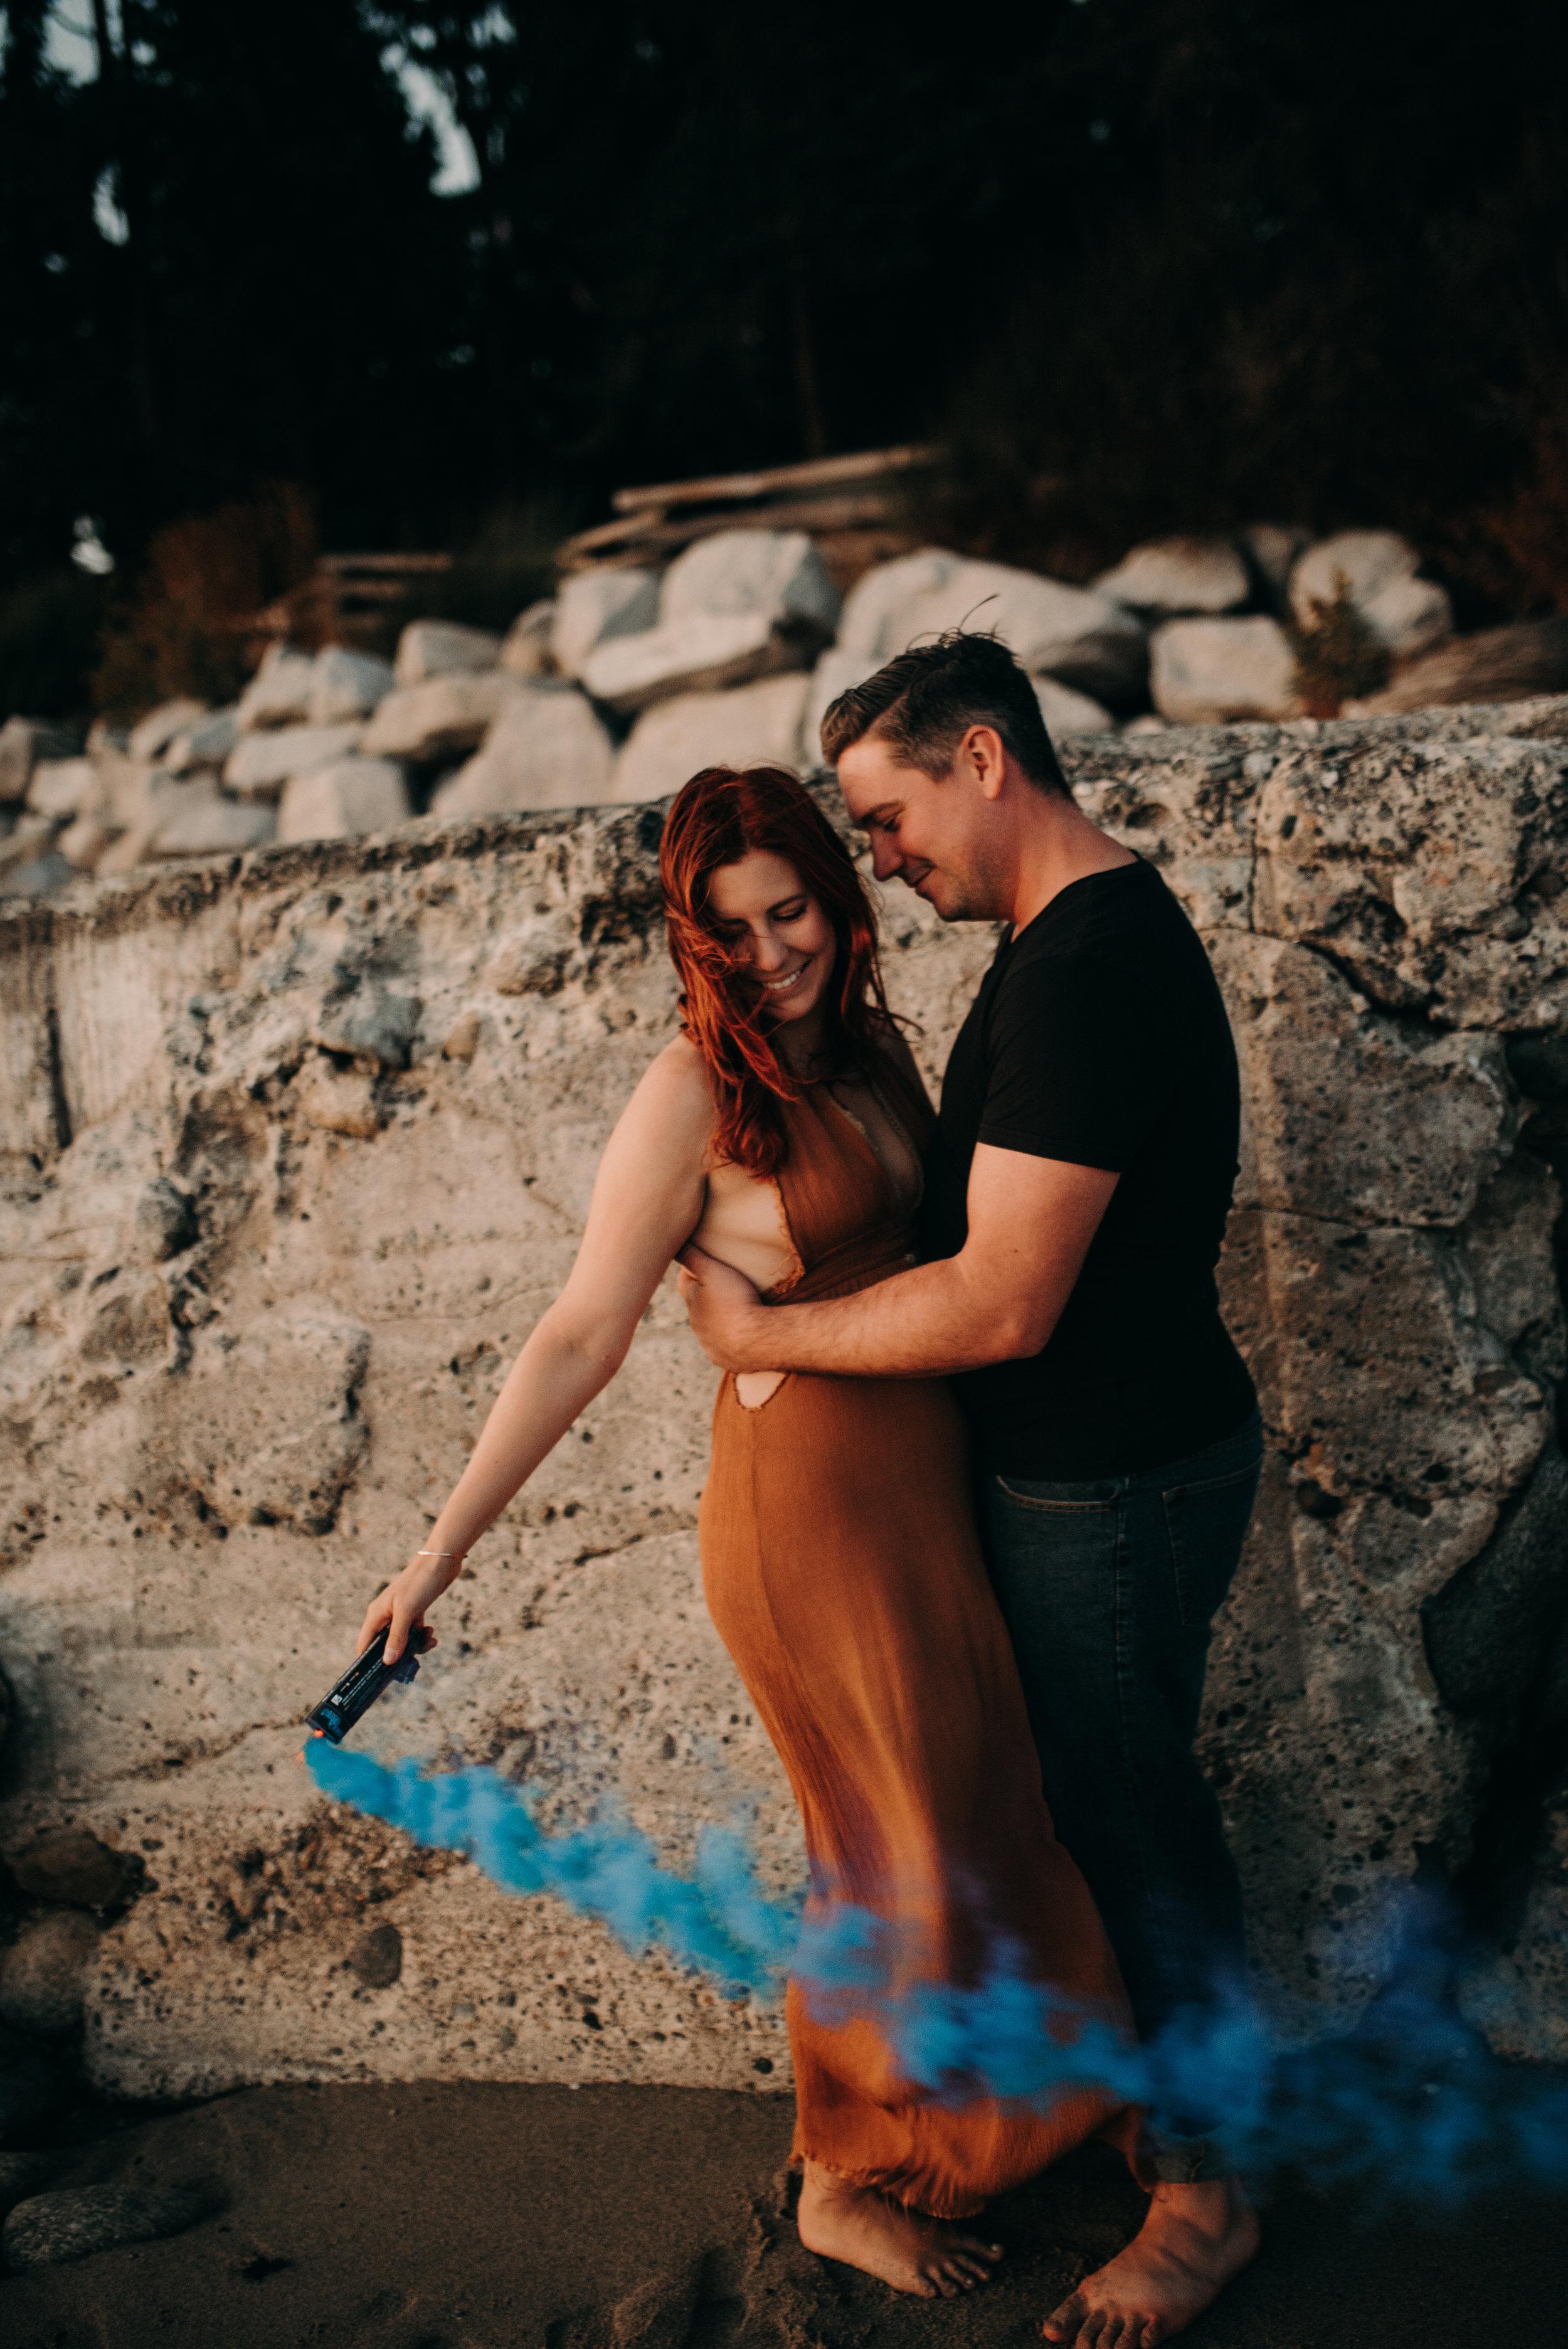 Kaylyn&SeanSeptember13,2017-LauraOlsonPhotography-SunshineCoastBCPhotographer-1114.jpg